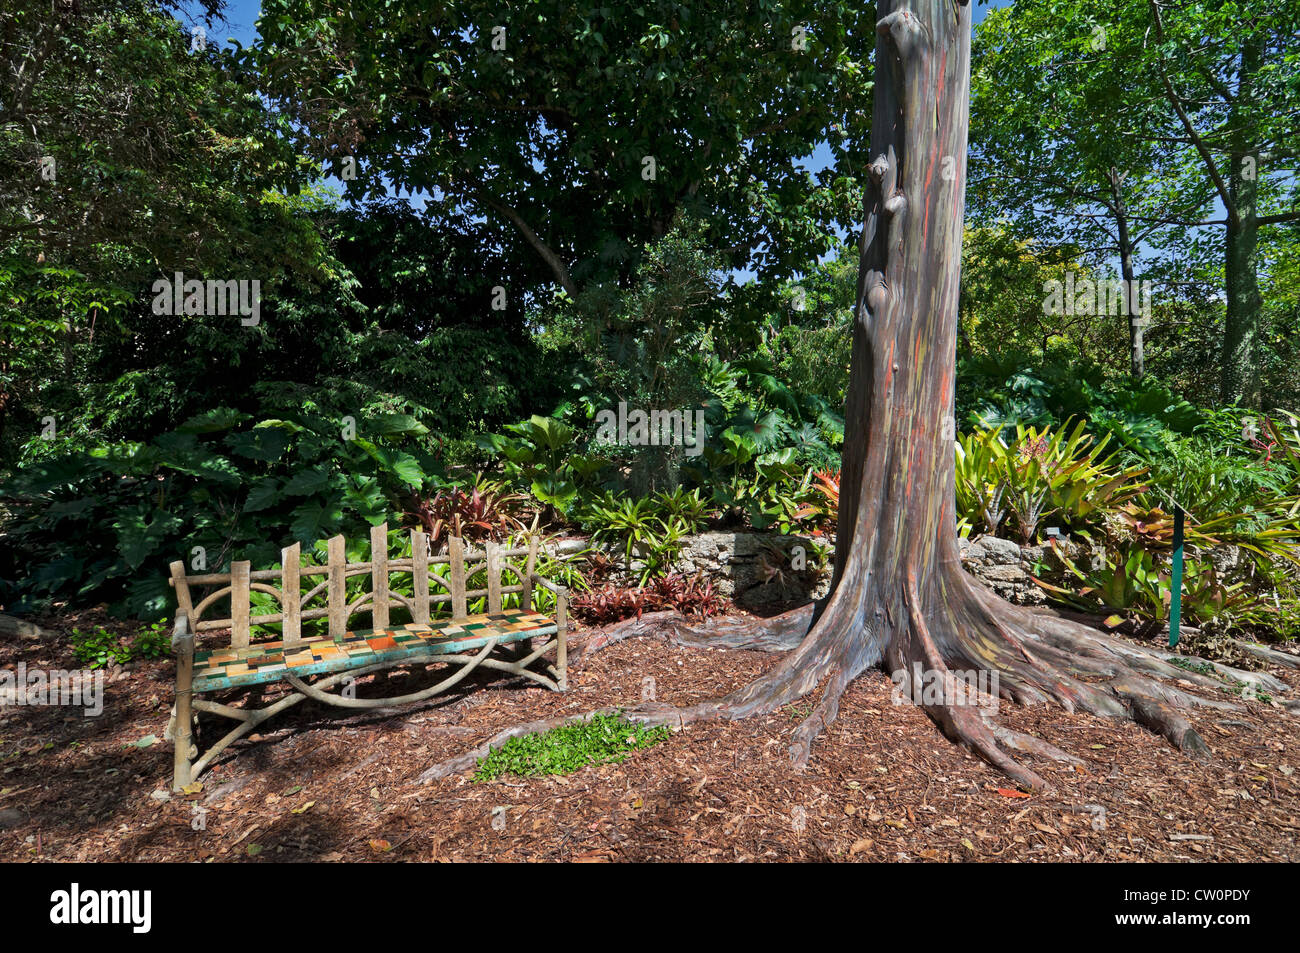 Fairchild Tropical Botanical Gardens at Coral Gables, a suburb of Miami,  Florida. Rainbow eucalyptus tree. - Stock Image